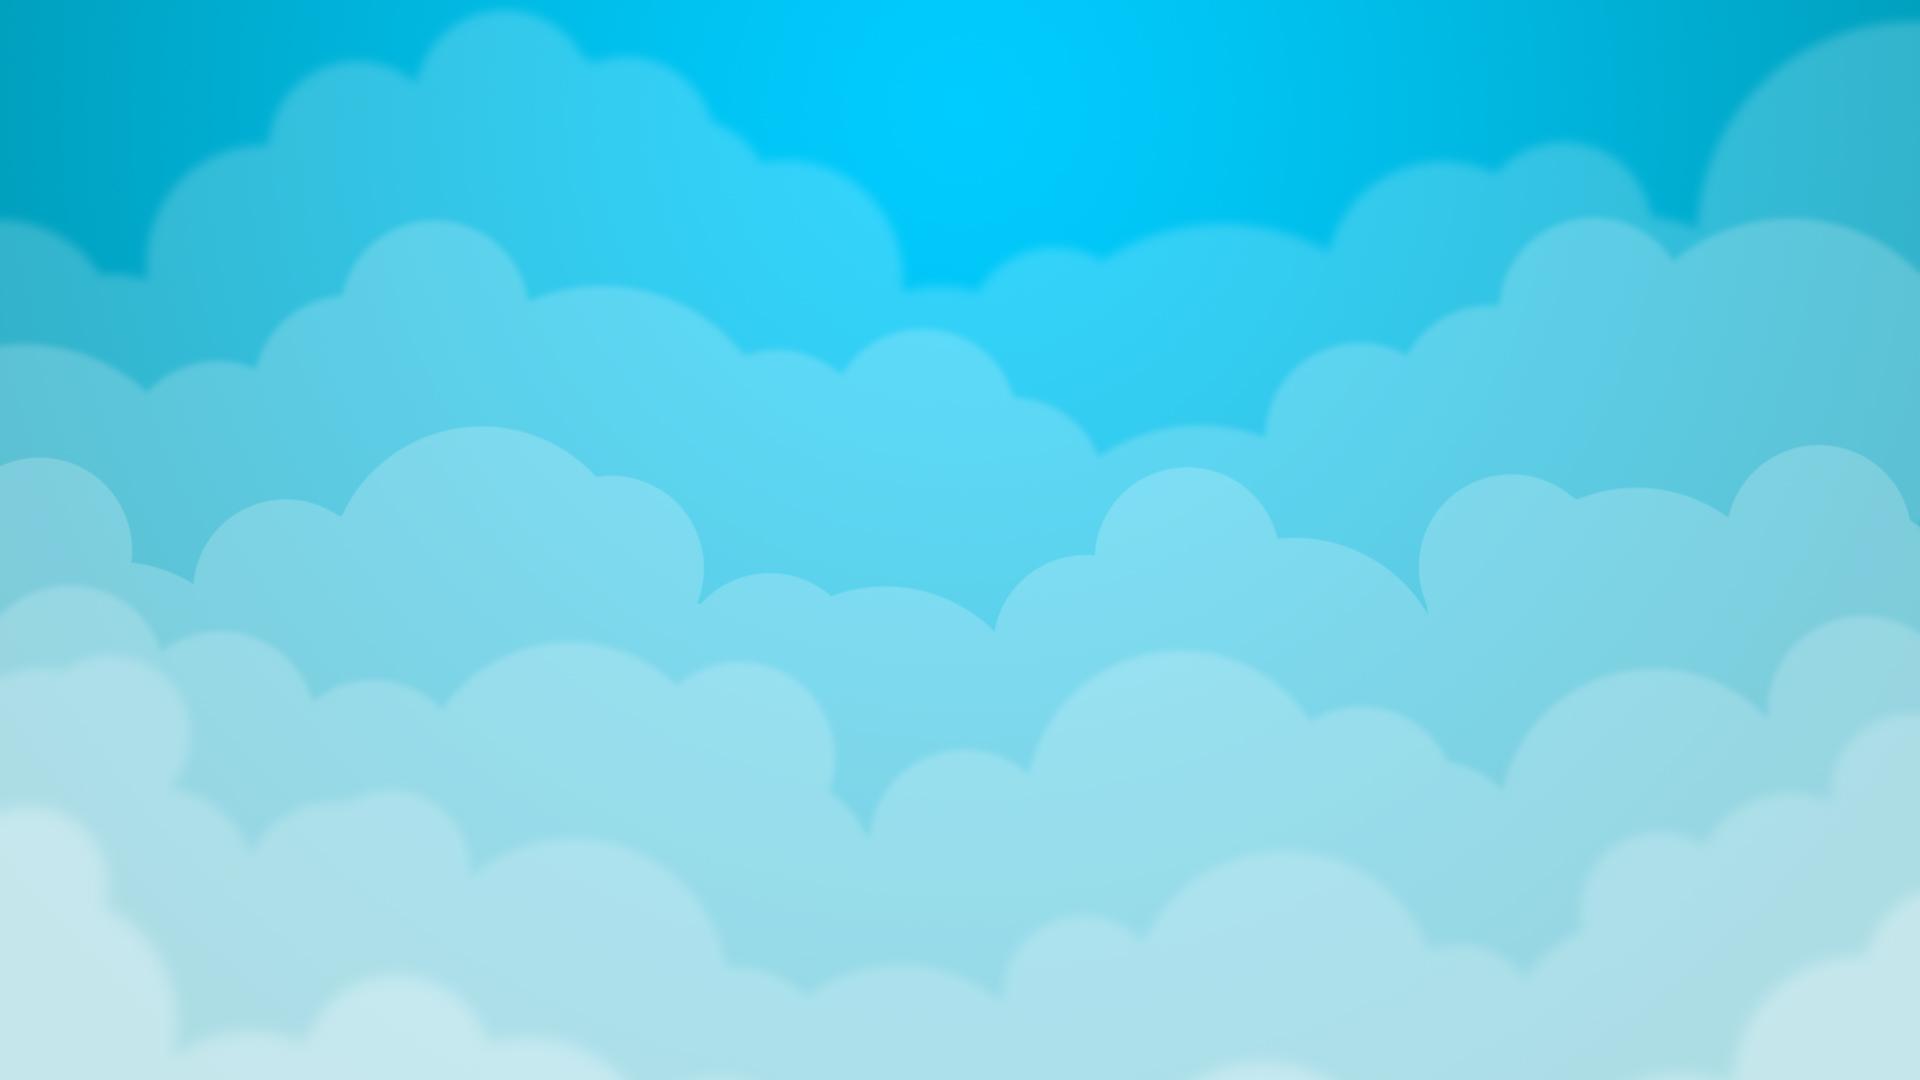 sky_texture1972